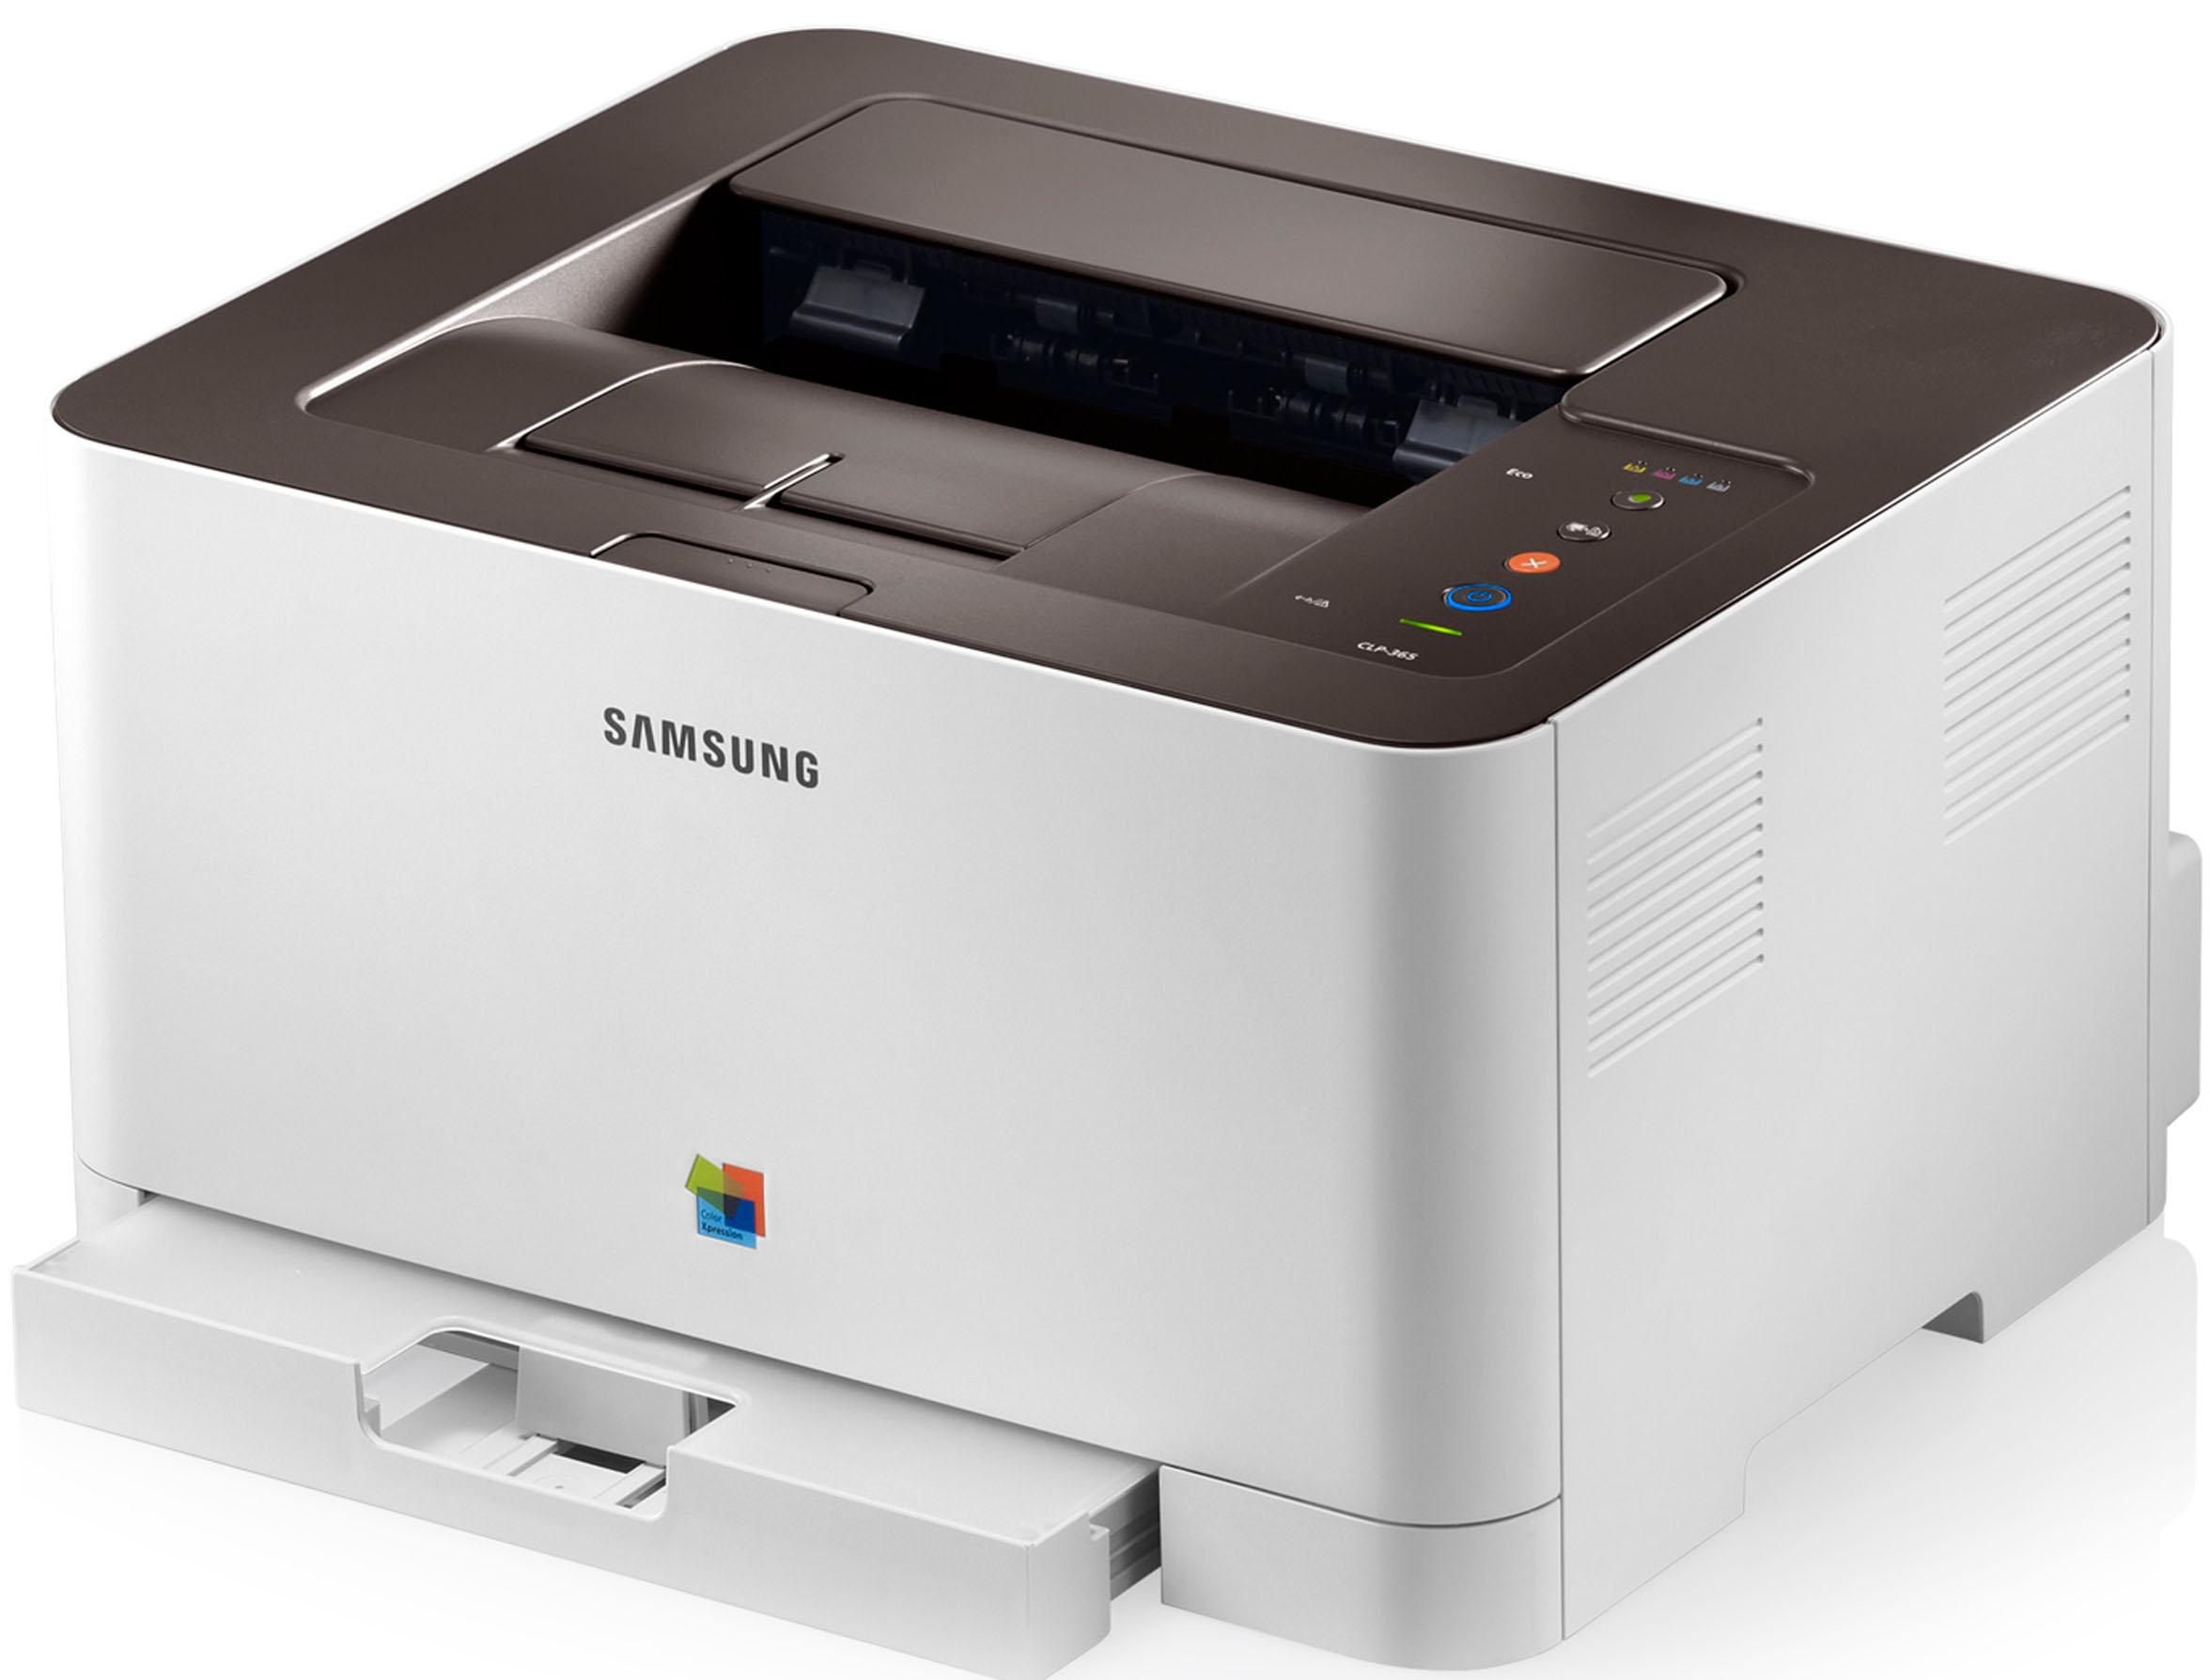 Samsung Clp 360 Driver Download